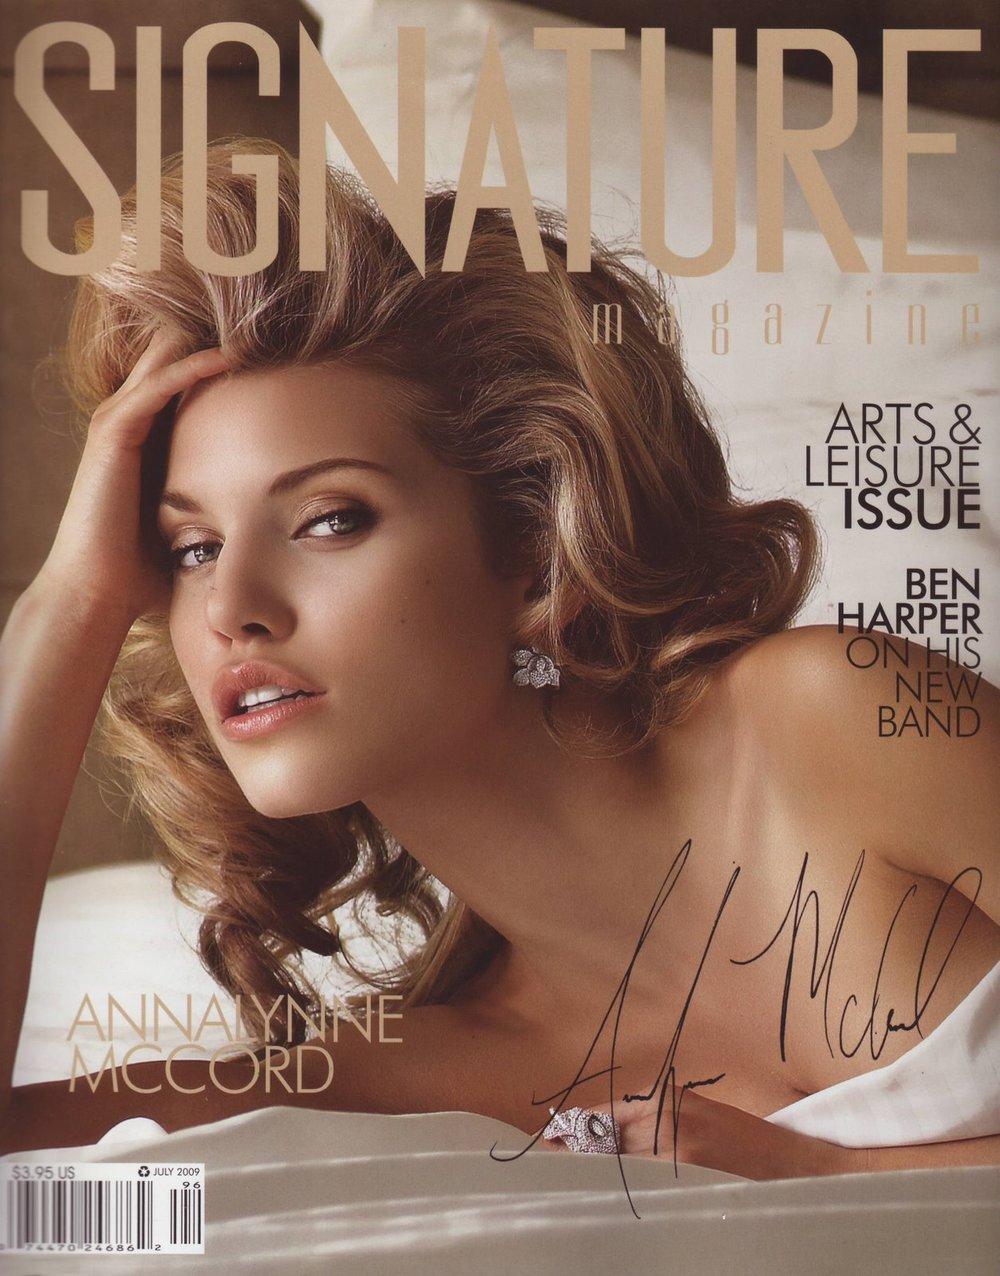 SignatureMagazine_July2009_CVR.JPG